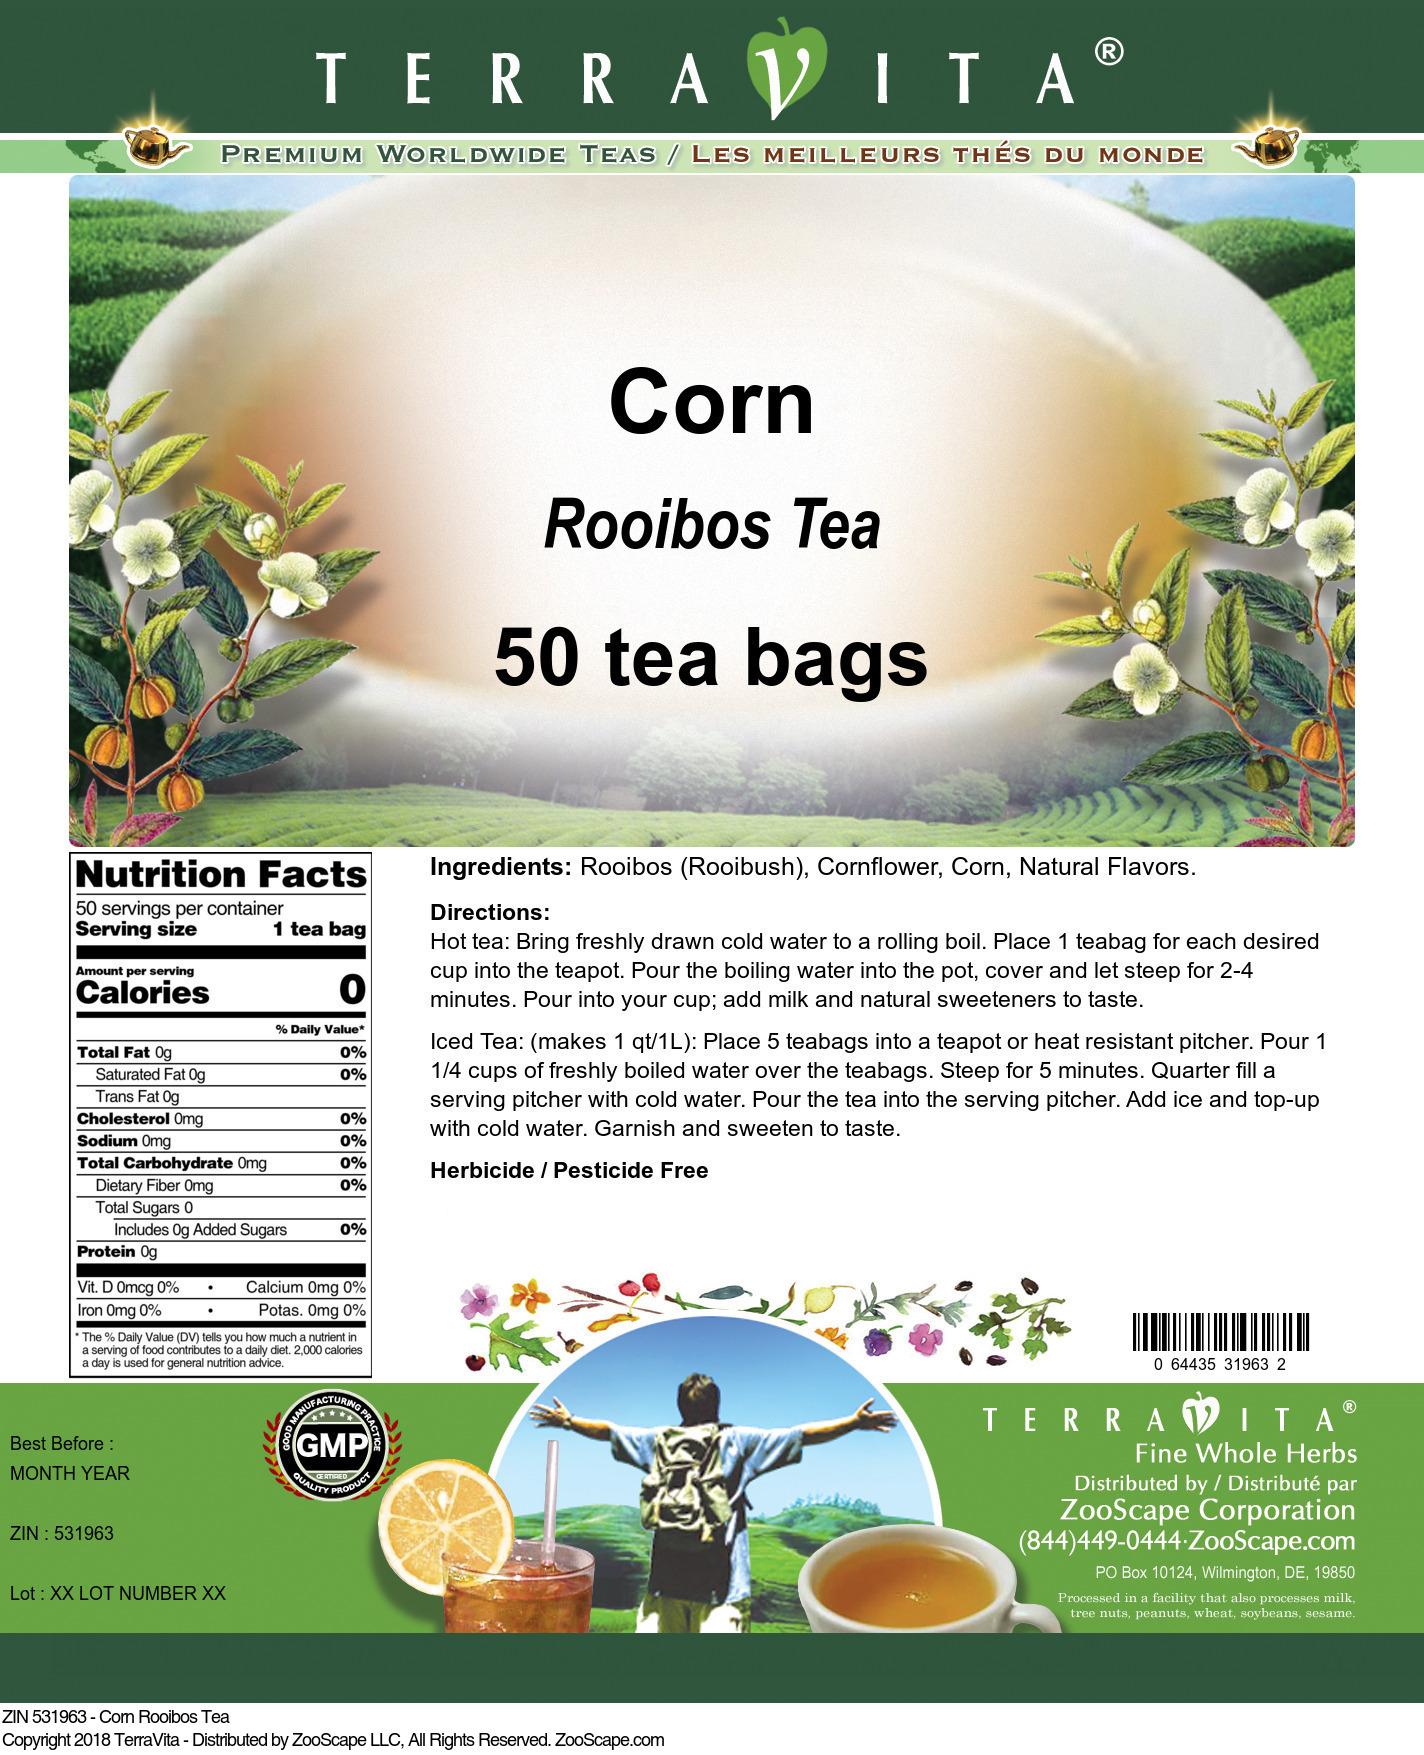 Corn Rooibos Tea